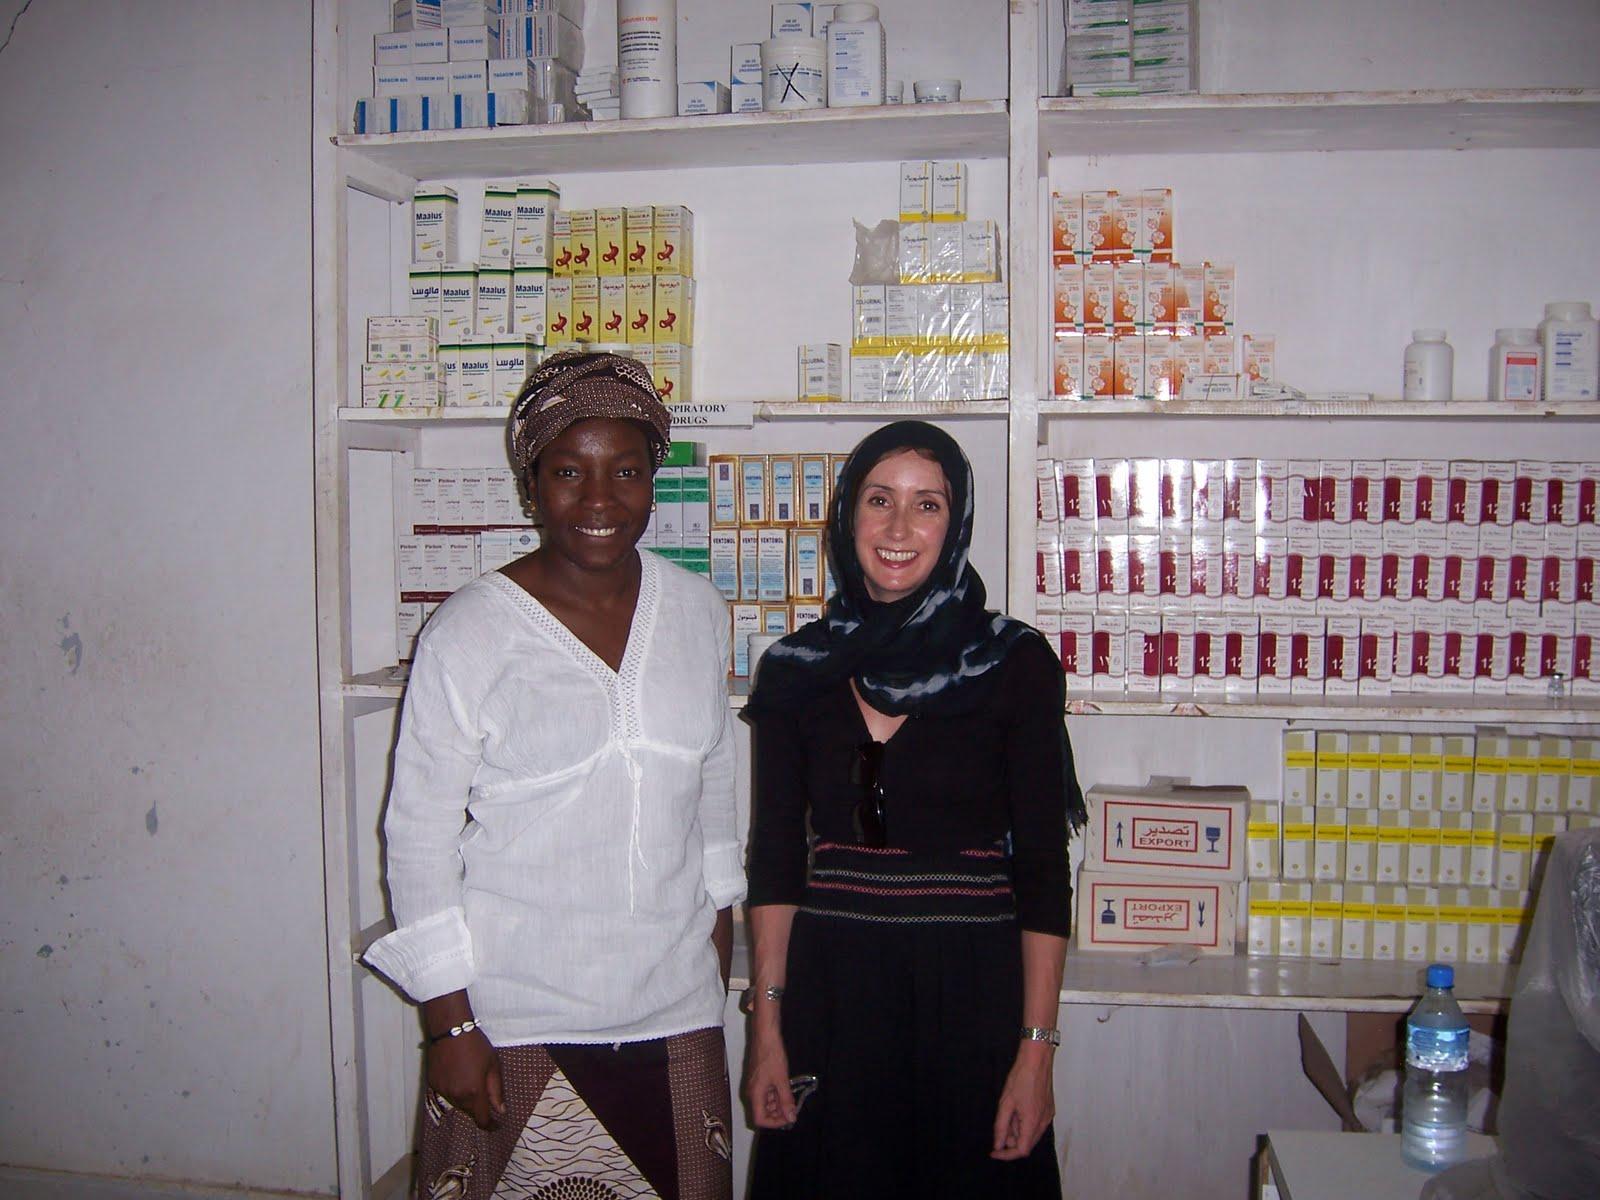 http://4.bp.blogspot.com/_hYD9BNp2t_c/TAvs5tdw54I/AAAAAAAAAB0/jj4bfKuaBmQ/s1600/Somaliland+048.JPG